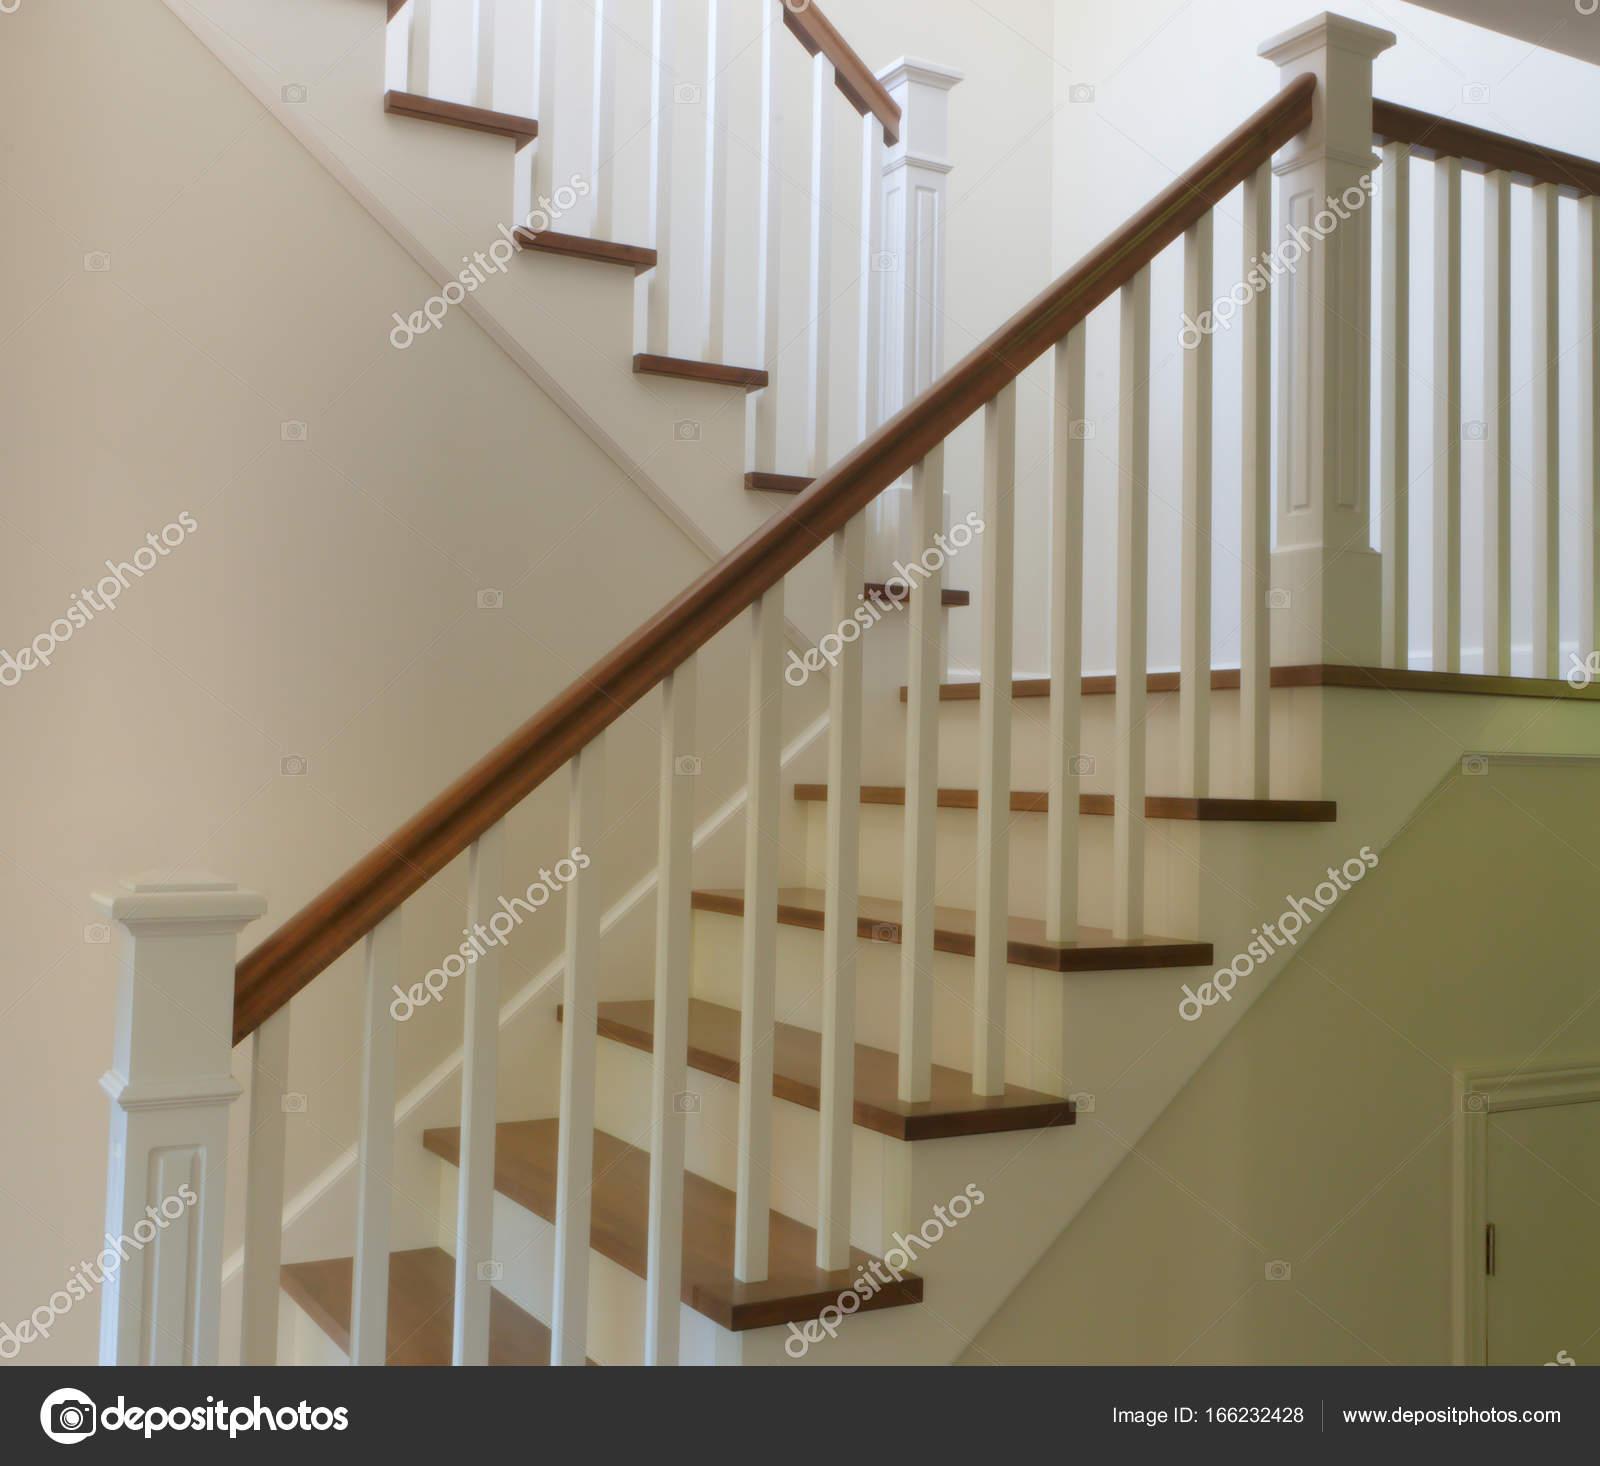 Fotos escalera madera blanca blanco escalera interior - Fotos de escaleras modernas ...